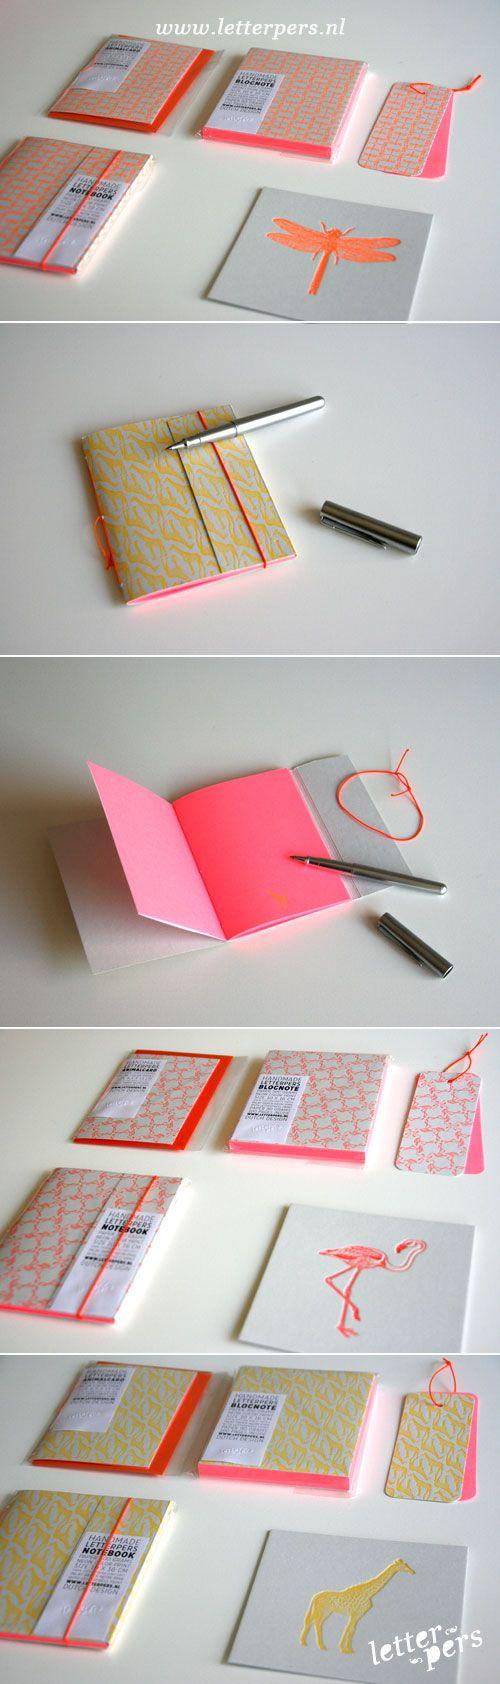 letterpers_letterpress_animal_serie_notitieboekje_notebook_cards_tag_blocnote.jpg (500×1684)